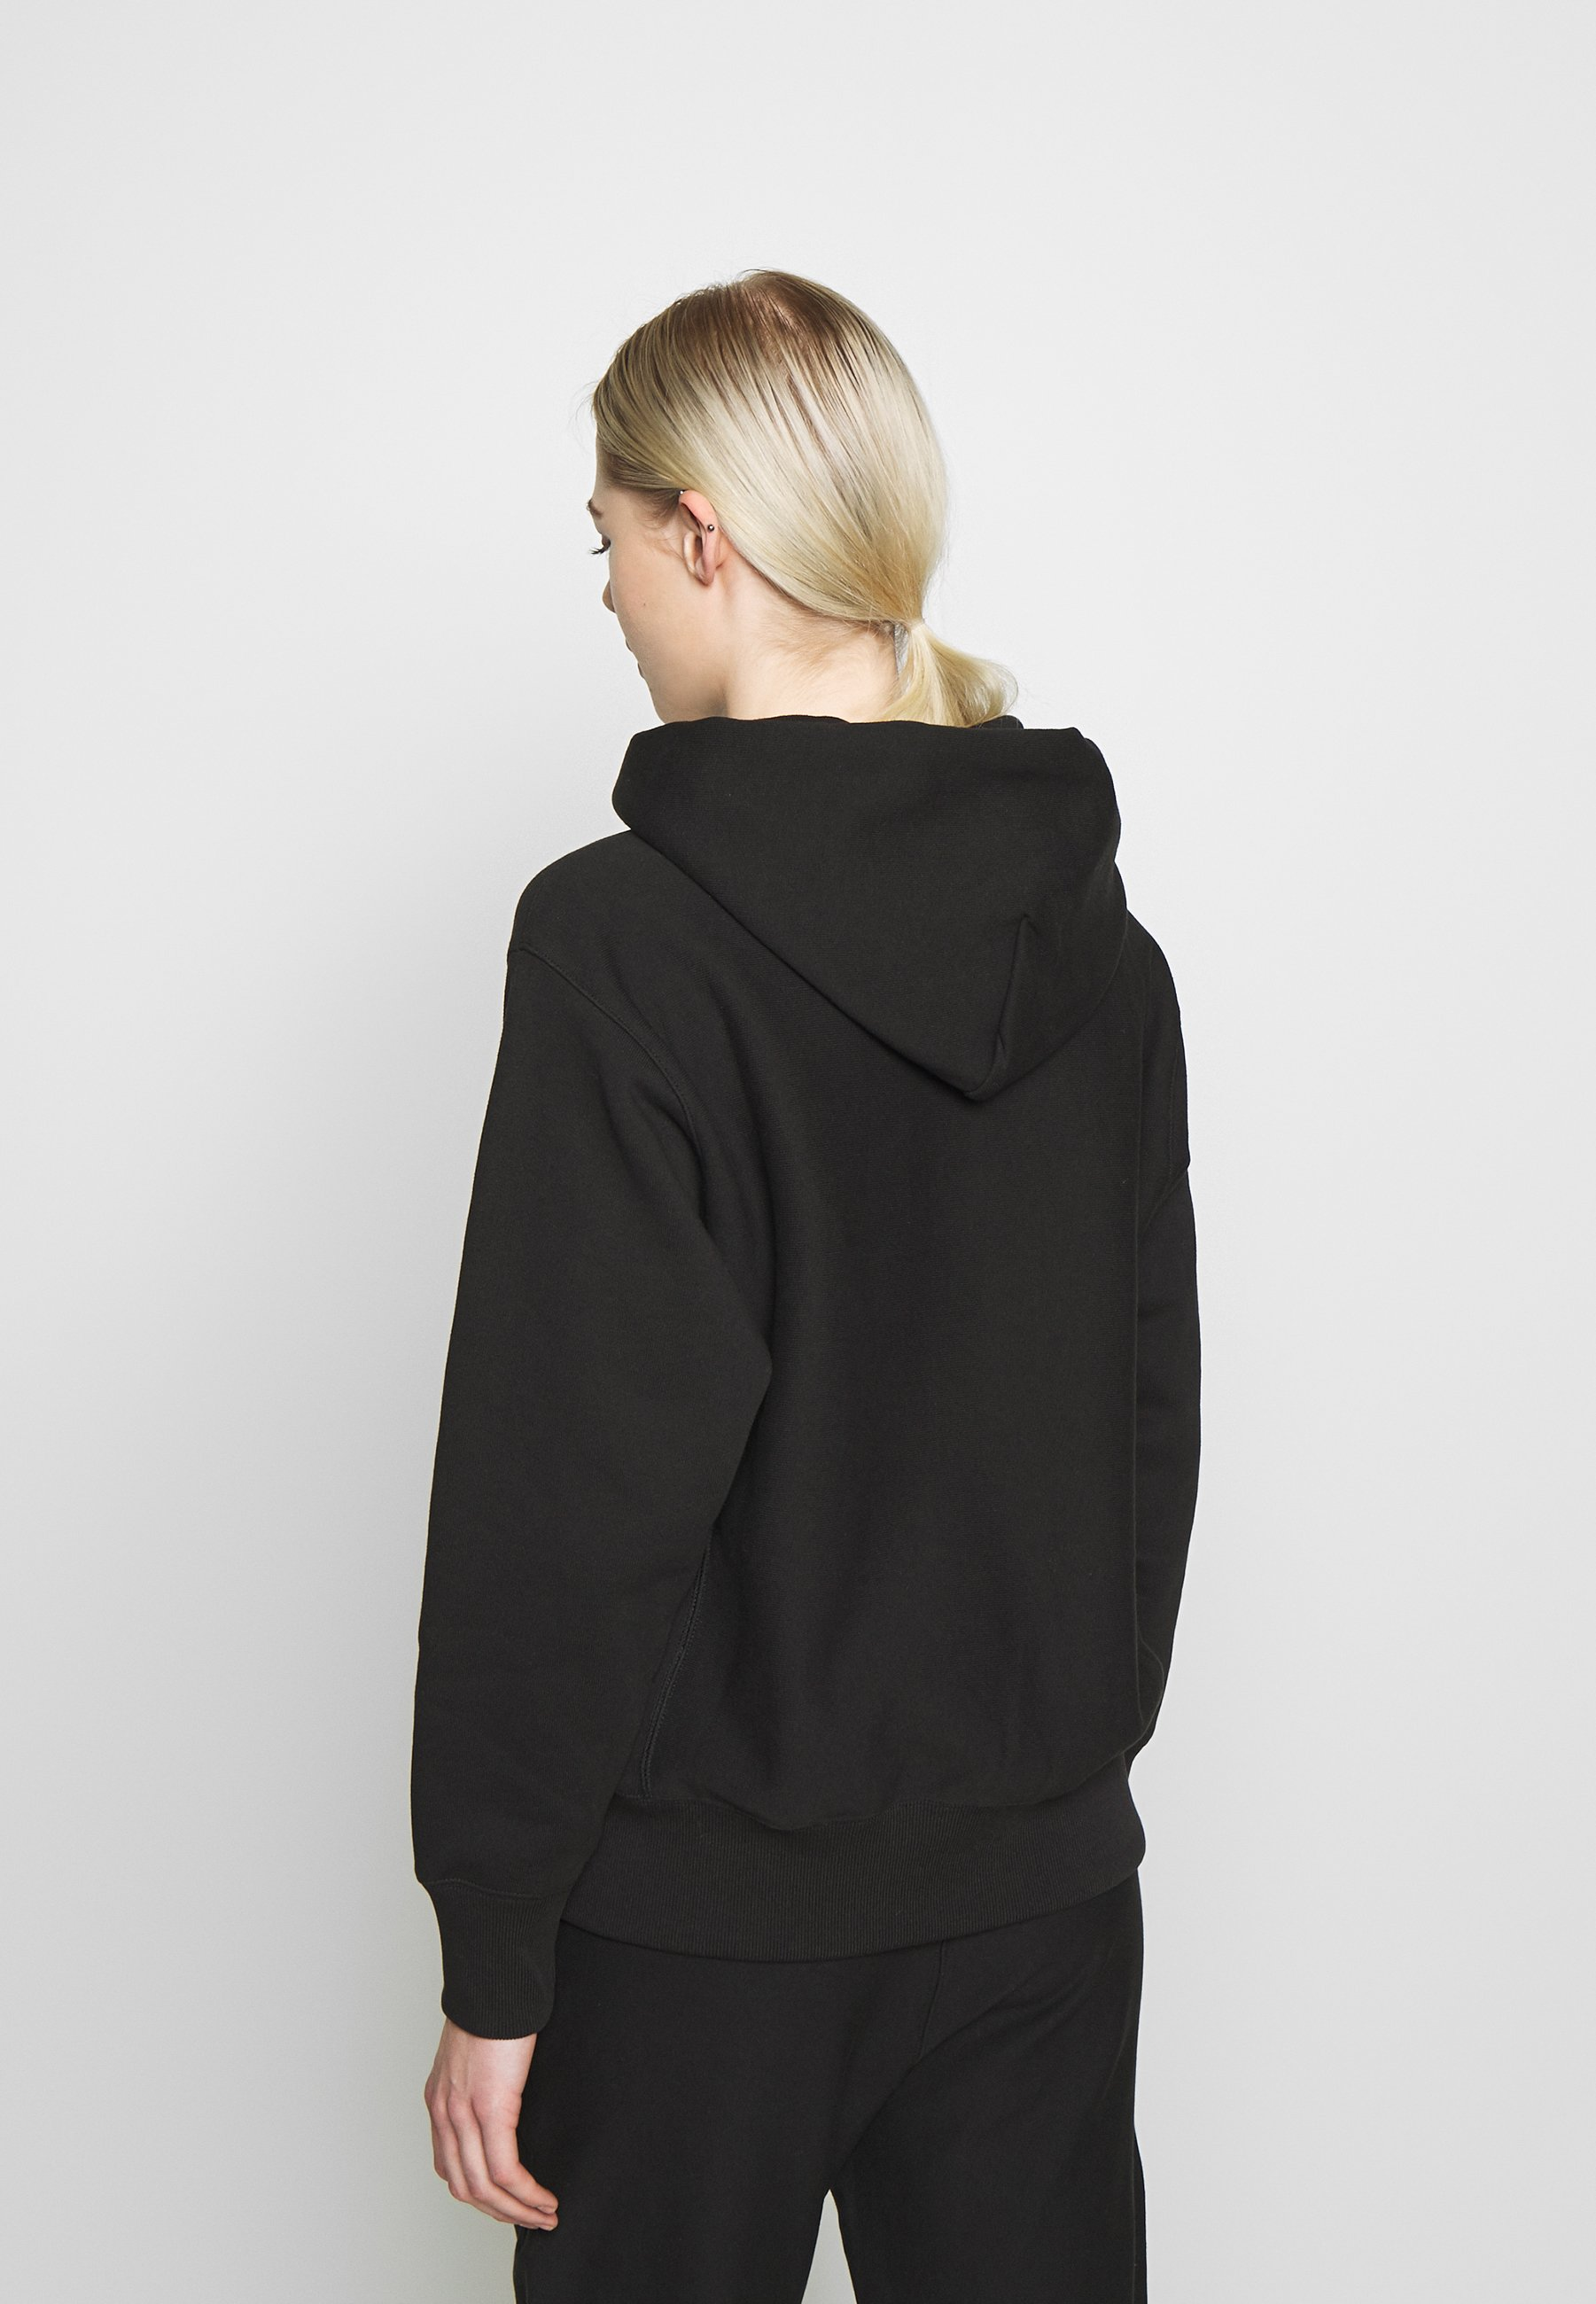 Wholesale Women's Clothing Champion Reverse Weave HOODED Hoodie black sSjod4psr